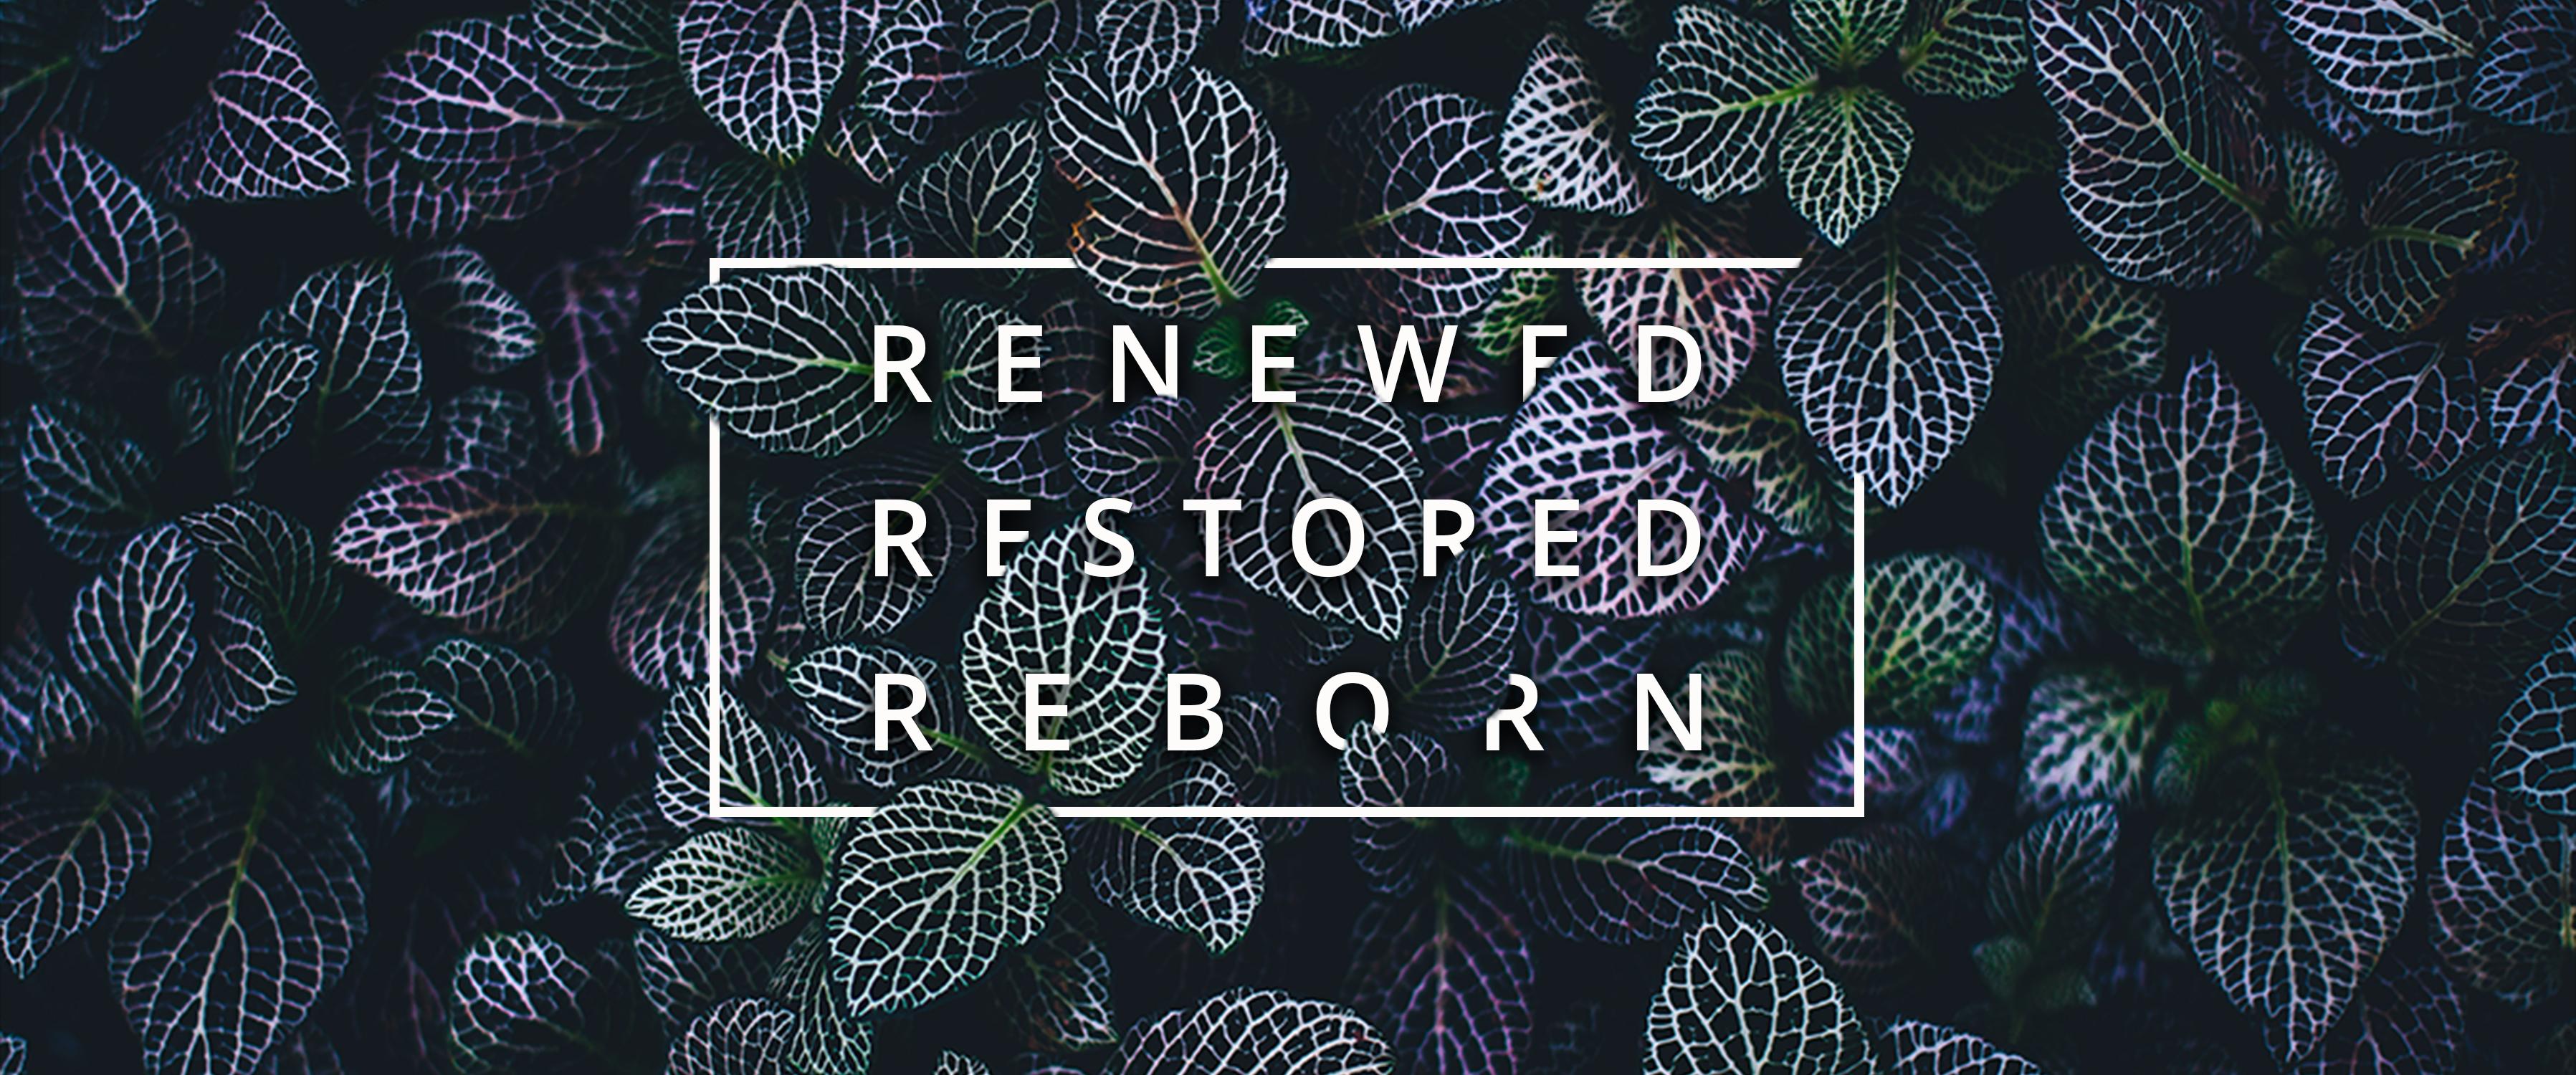 Renewed, Restored, Reborn